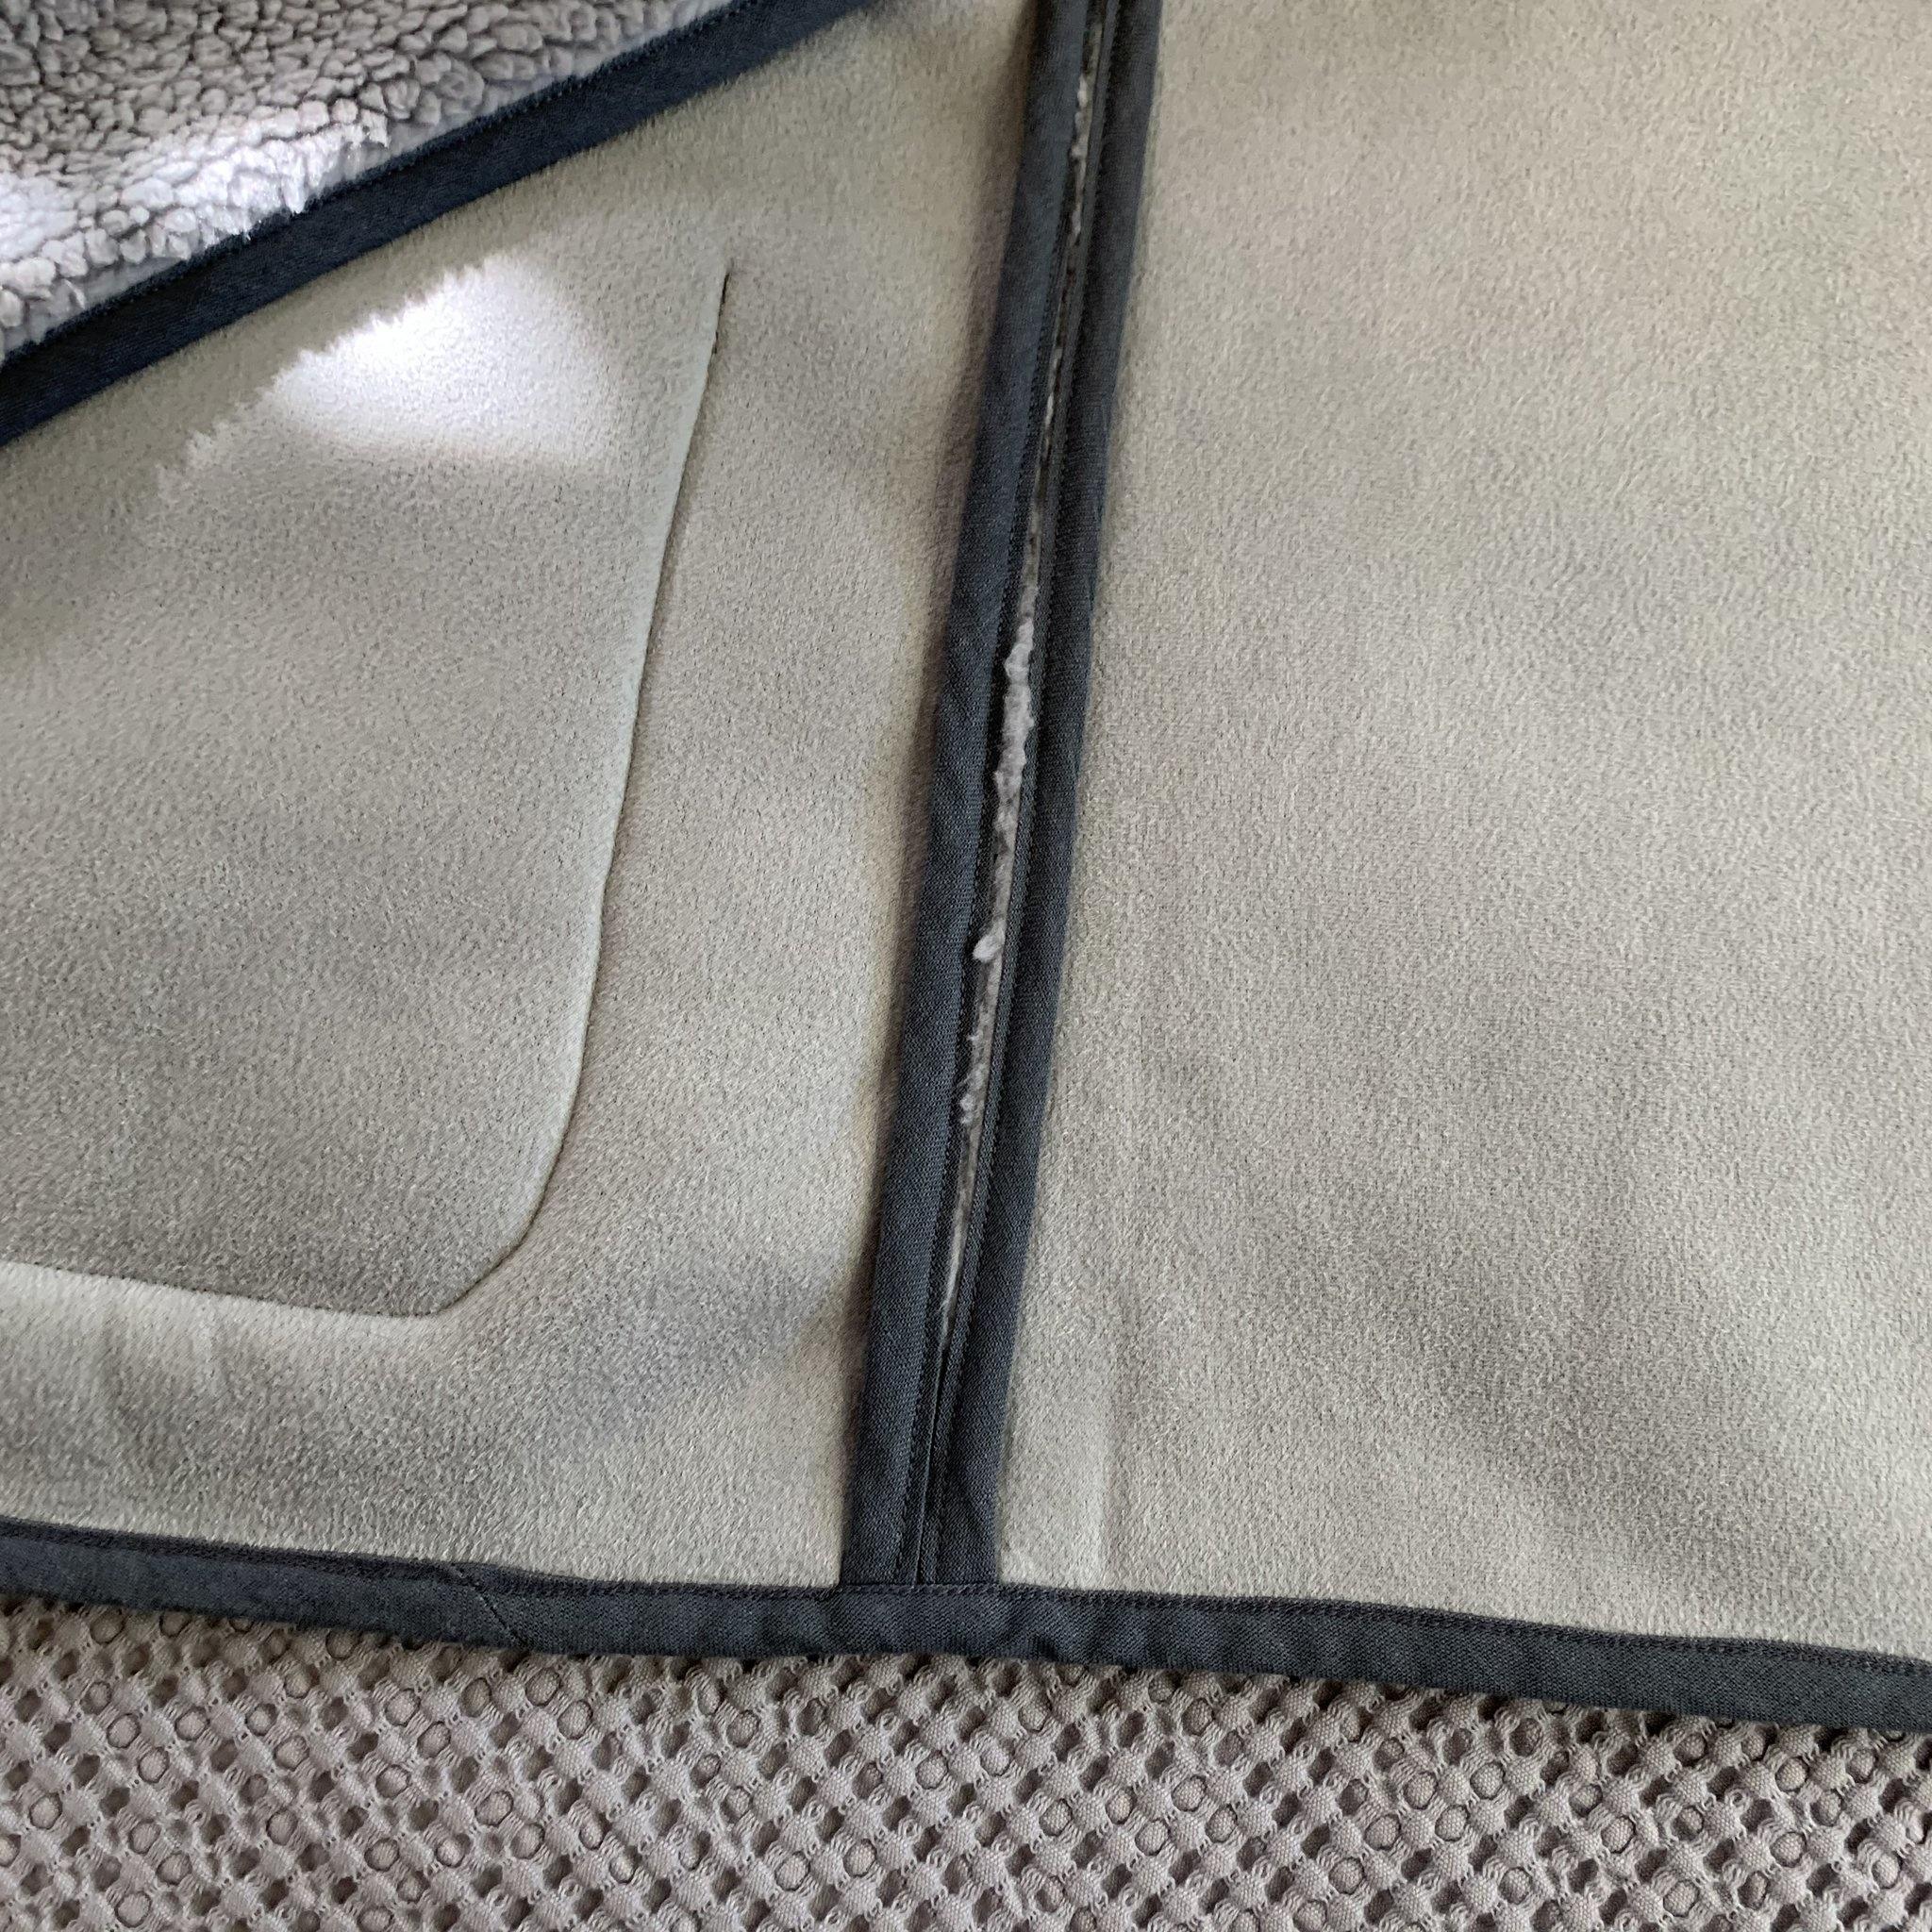 April Meets October November Vest, Grey, One Size Fits All